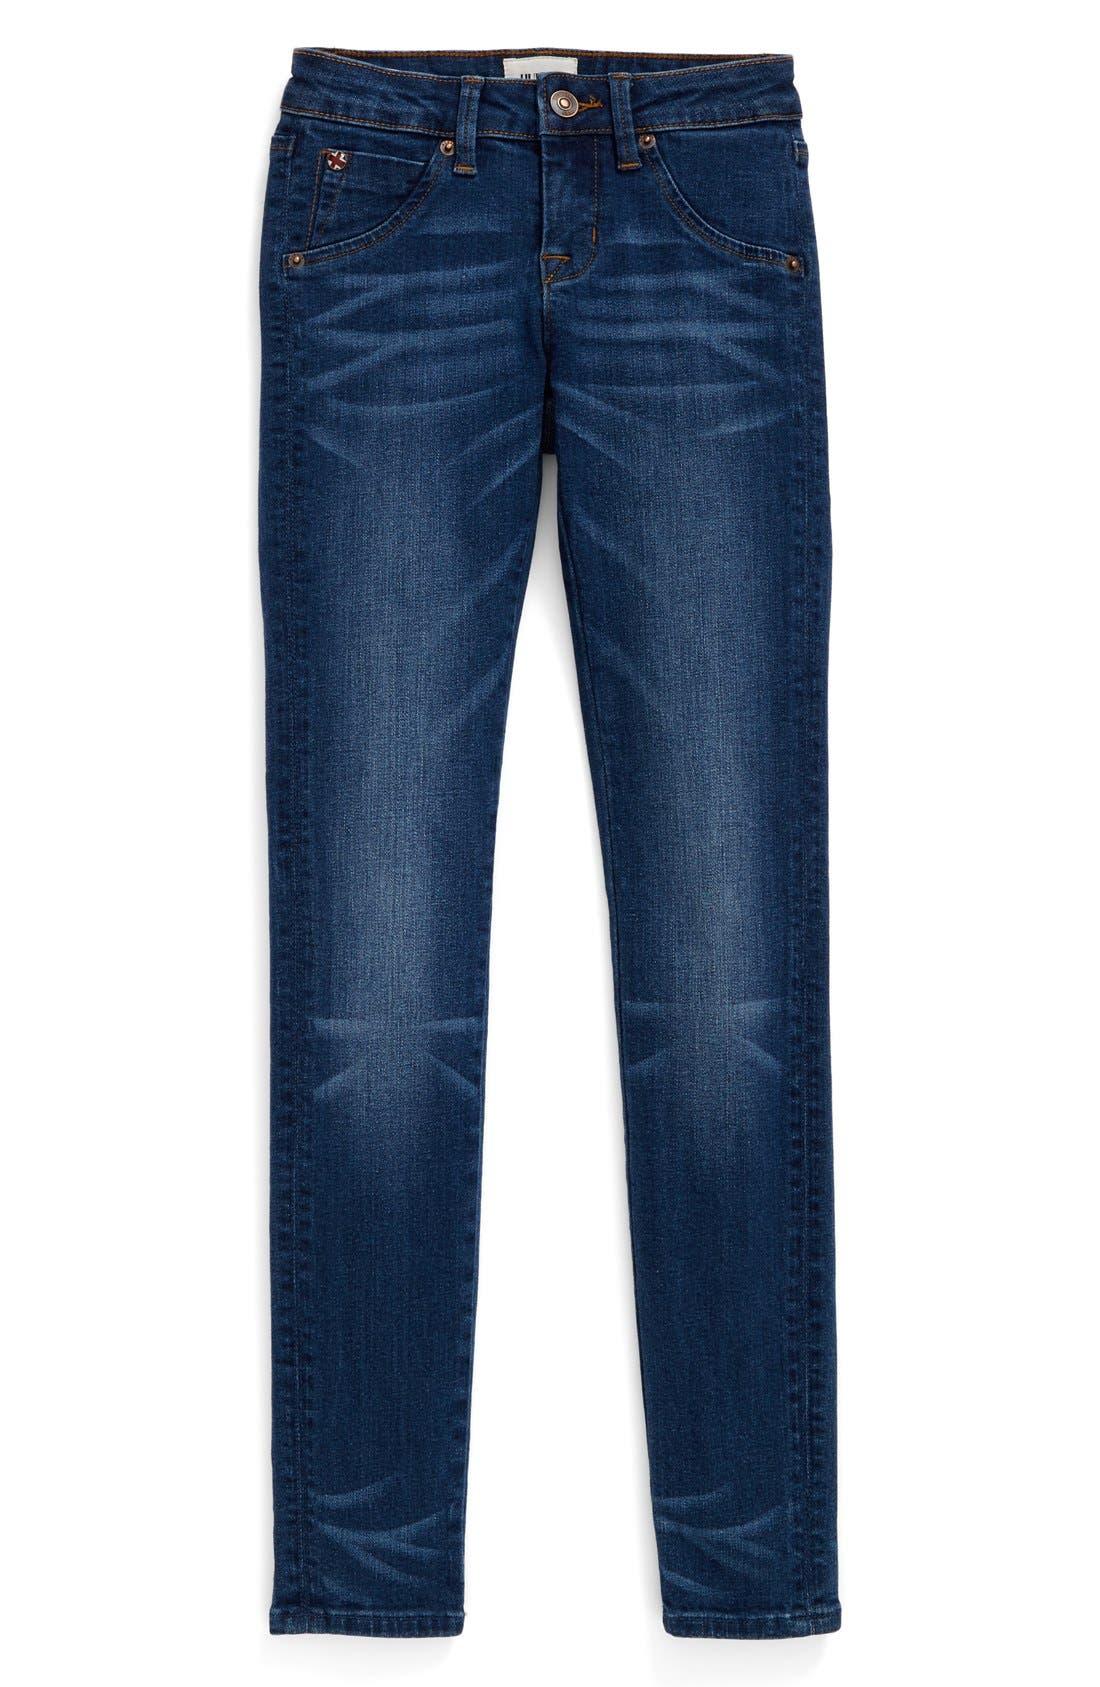 HUDSON KIDS 'Collin' Skinny Jeans, Main, color, 484